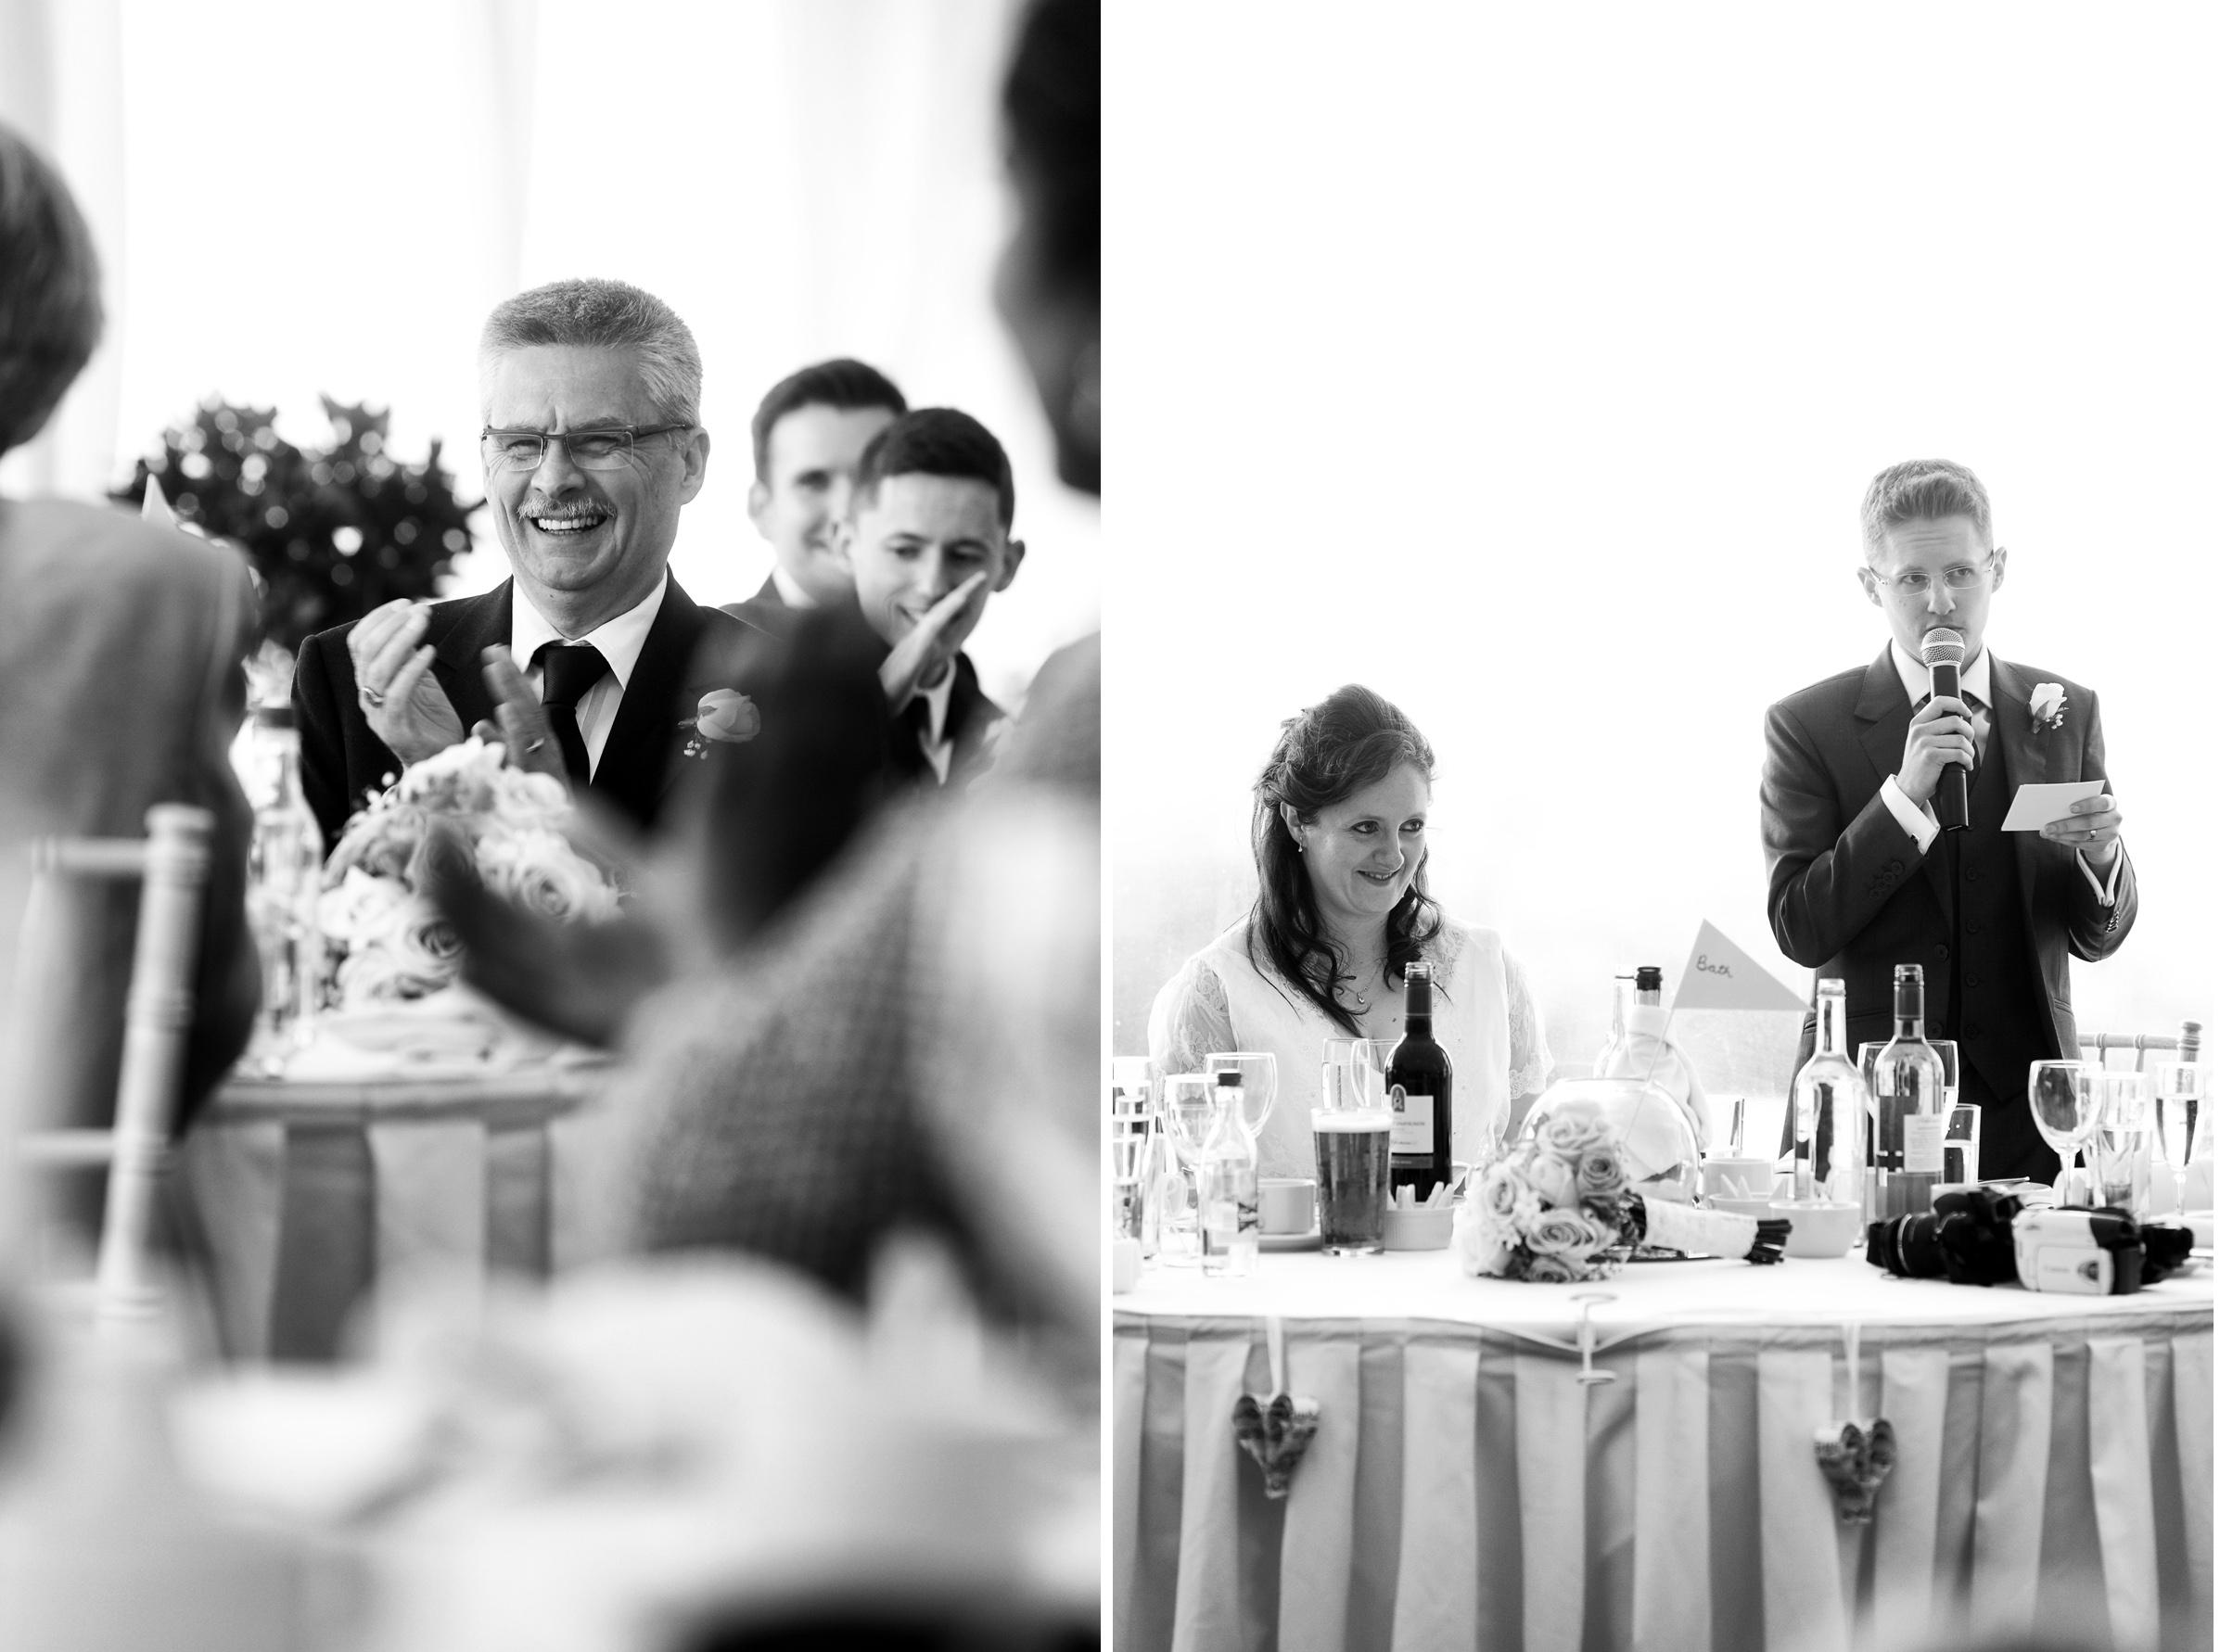 Ocean-View-Gower-Wedding-Photographer-062.jpg